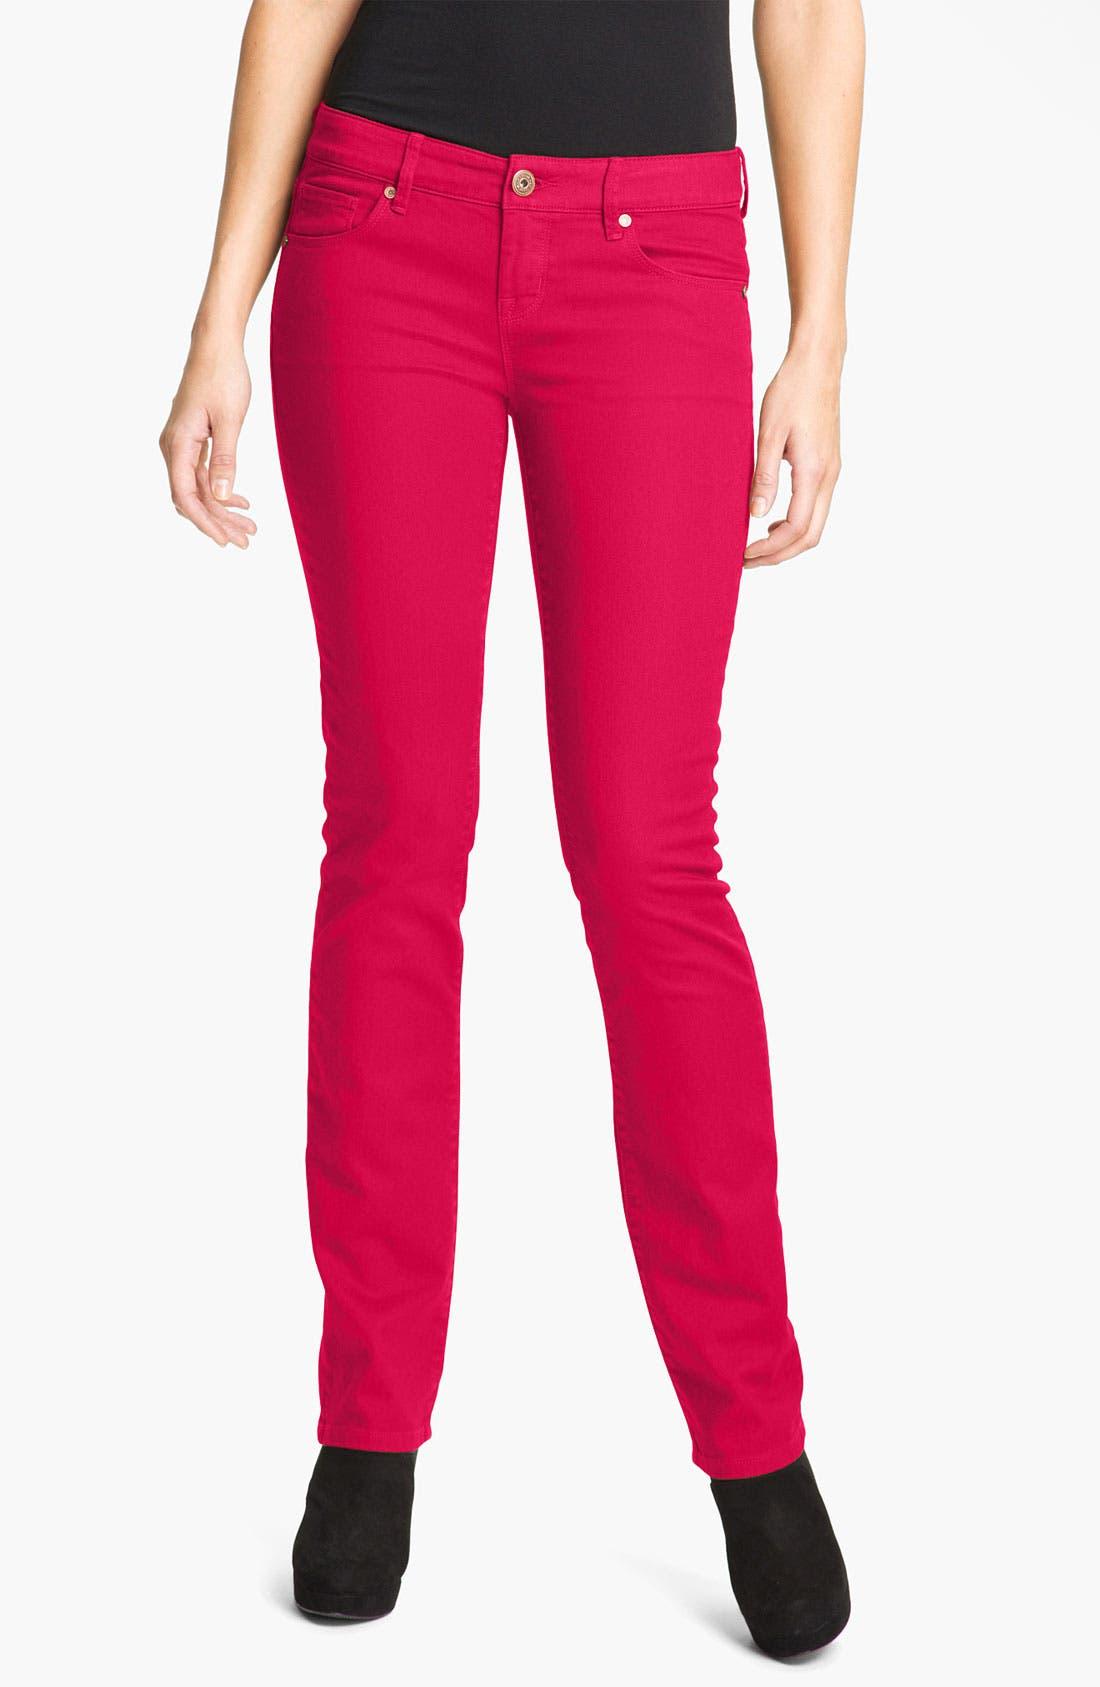 Alternate Image 1 Selected - Isaac Mizrahi Jeans 'Emma' Straight Leg Jeans